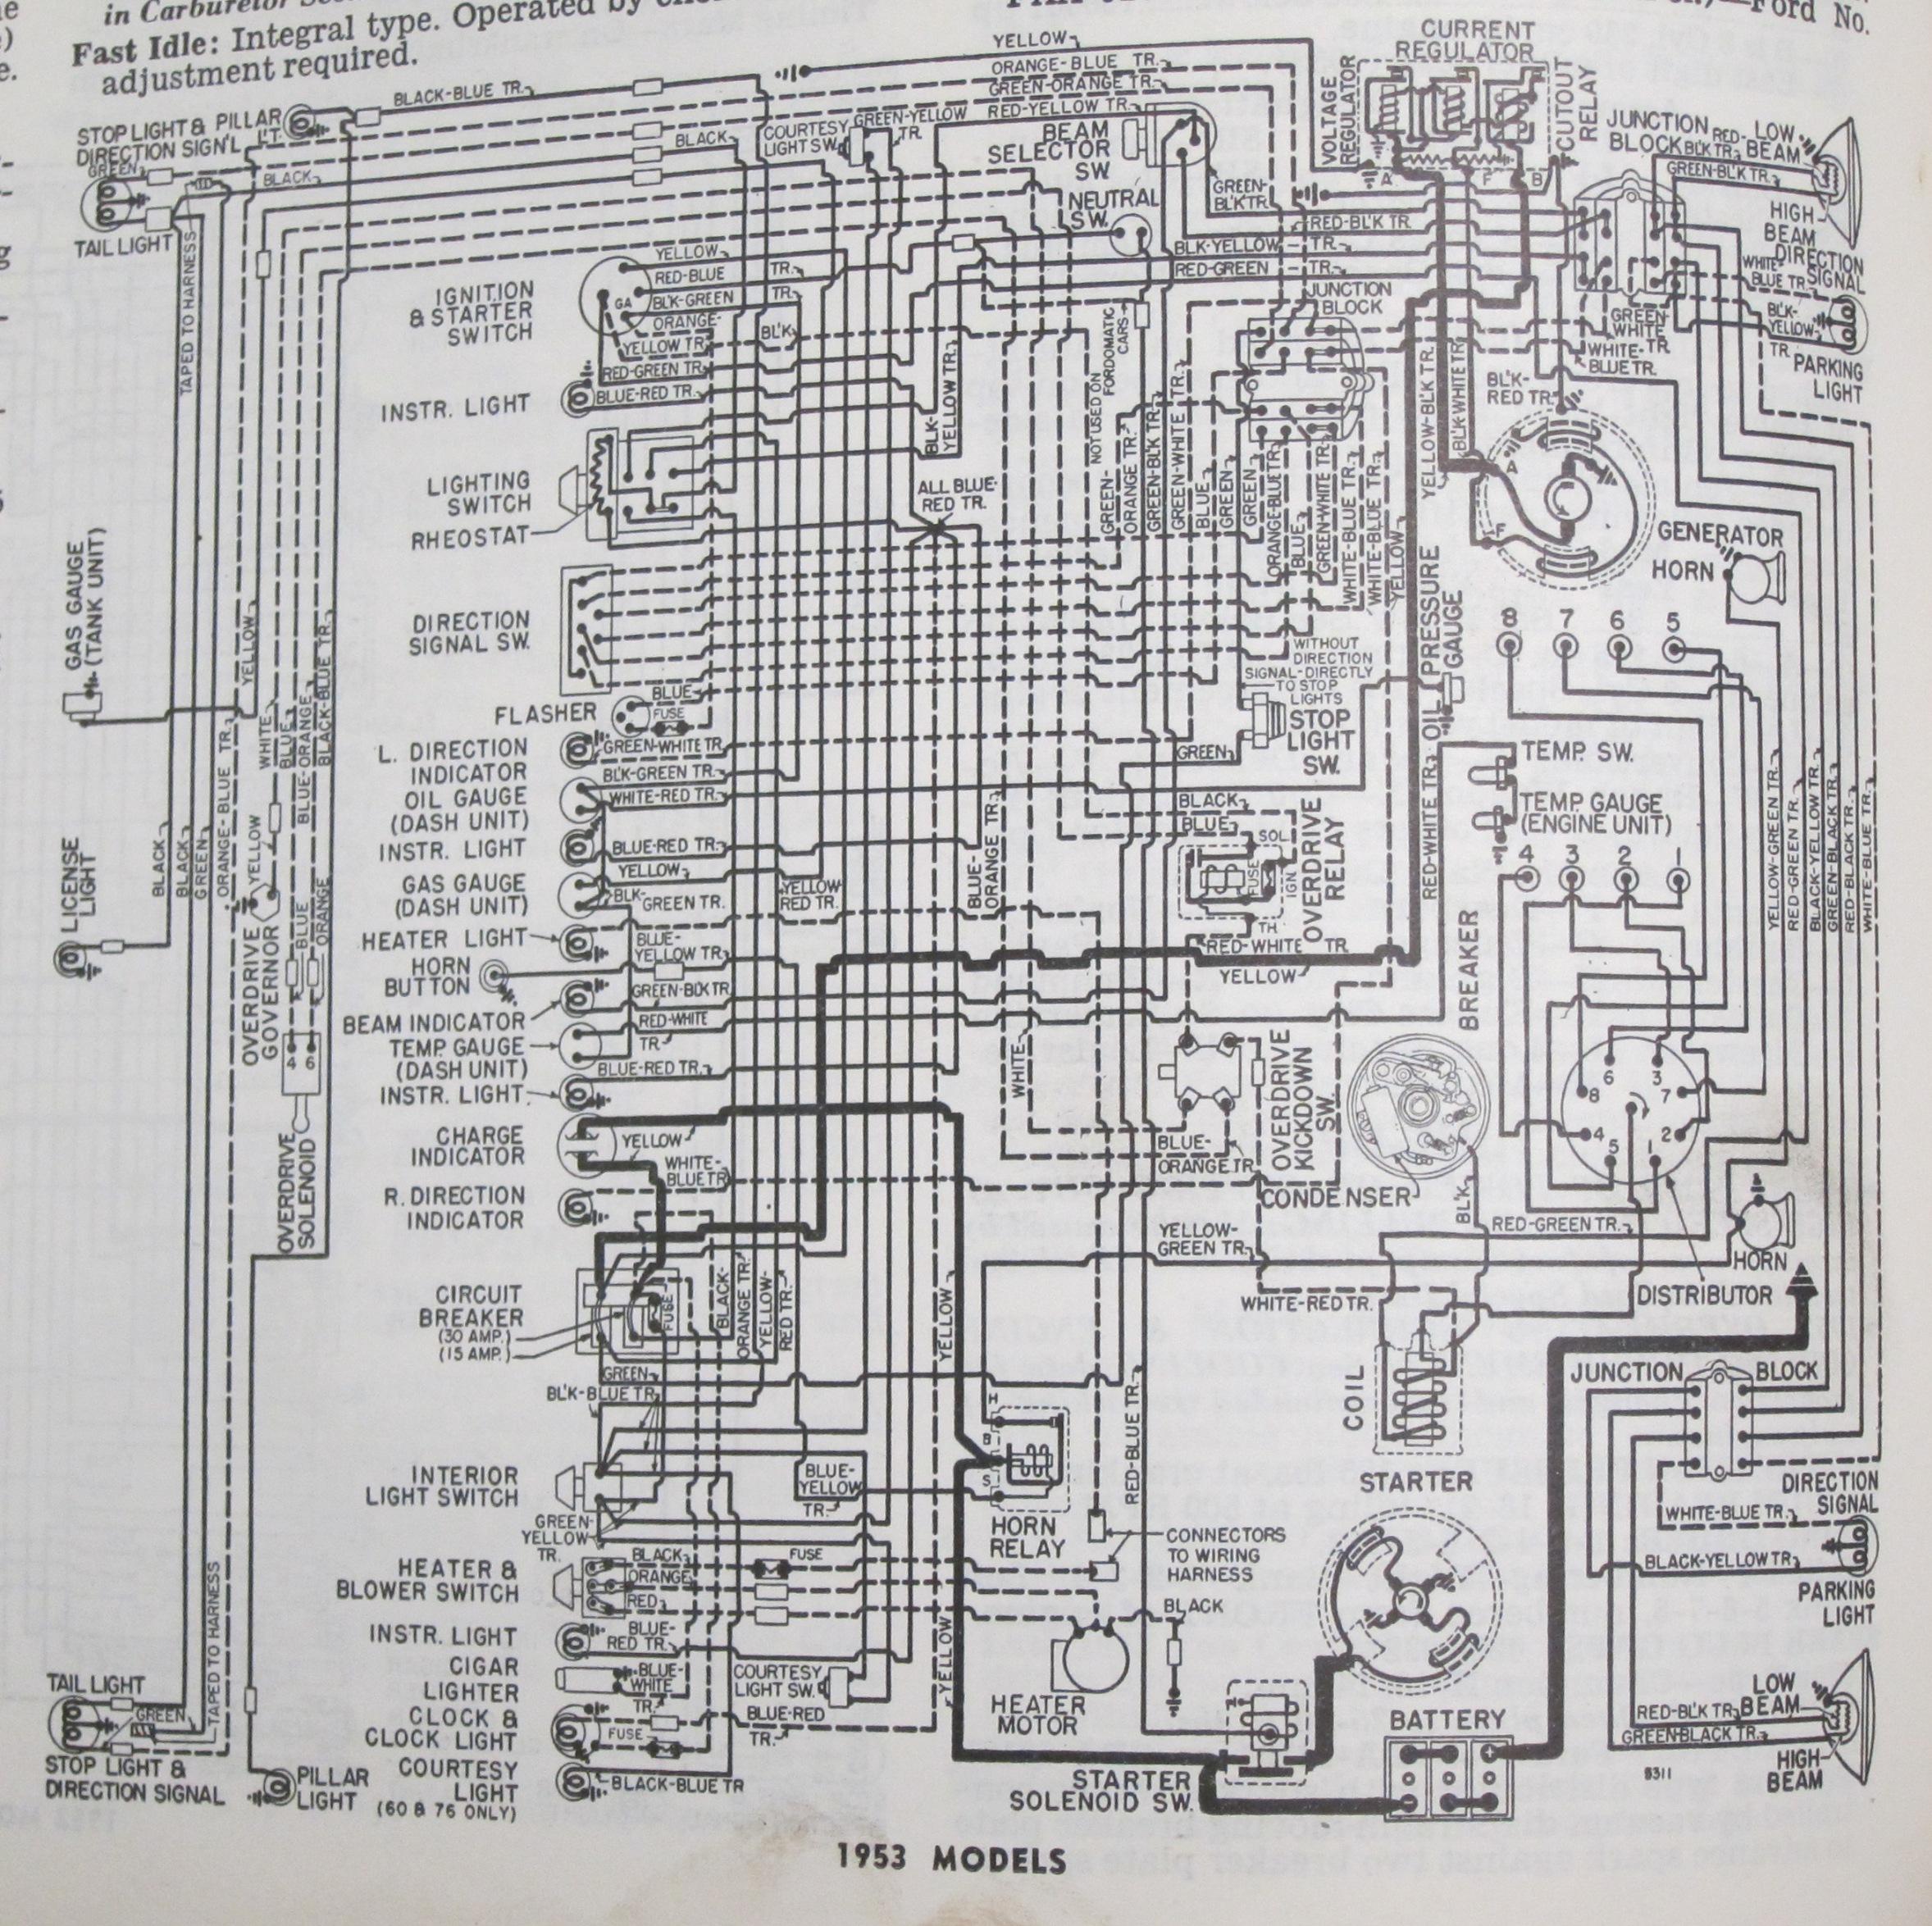 54 Ford Customline Wiring Diagram Wiring Diagram Console1 Console1 Bujinkan It